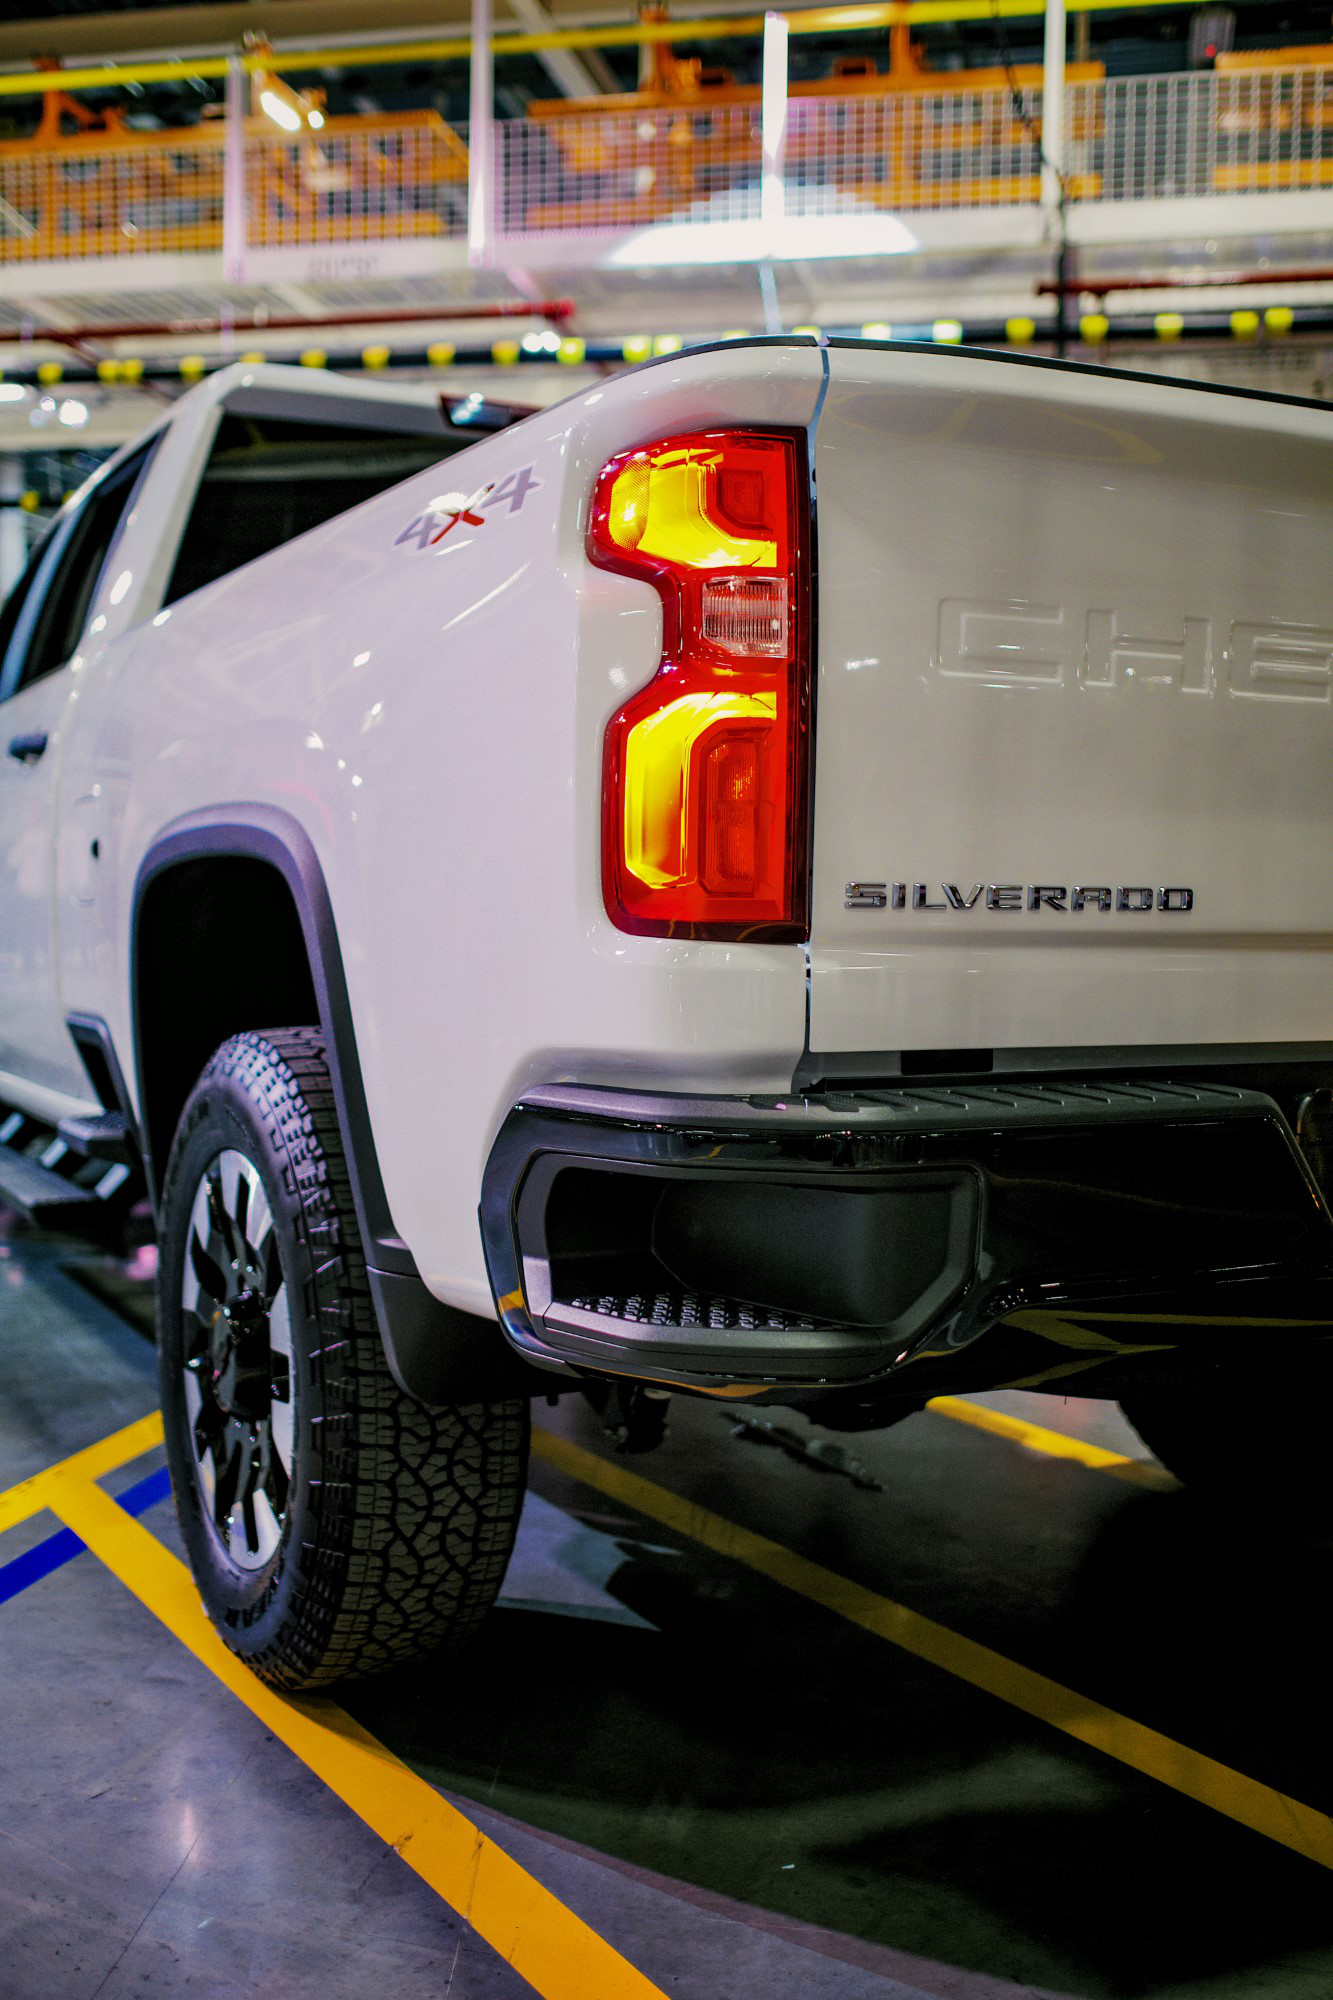 Chevrolet Silverado Heavy Duty made for heavy equipment